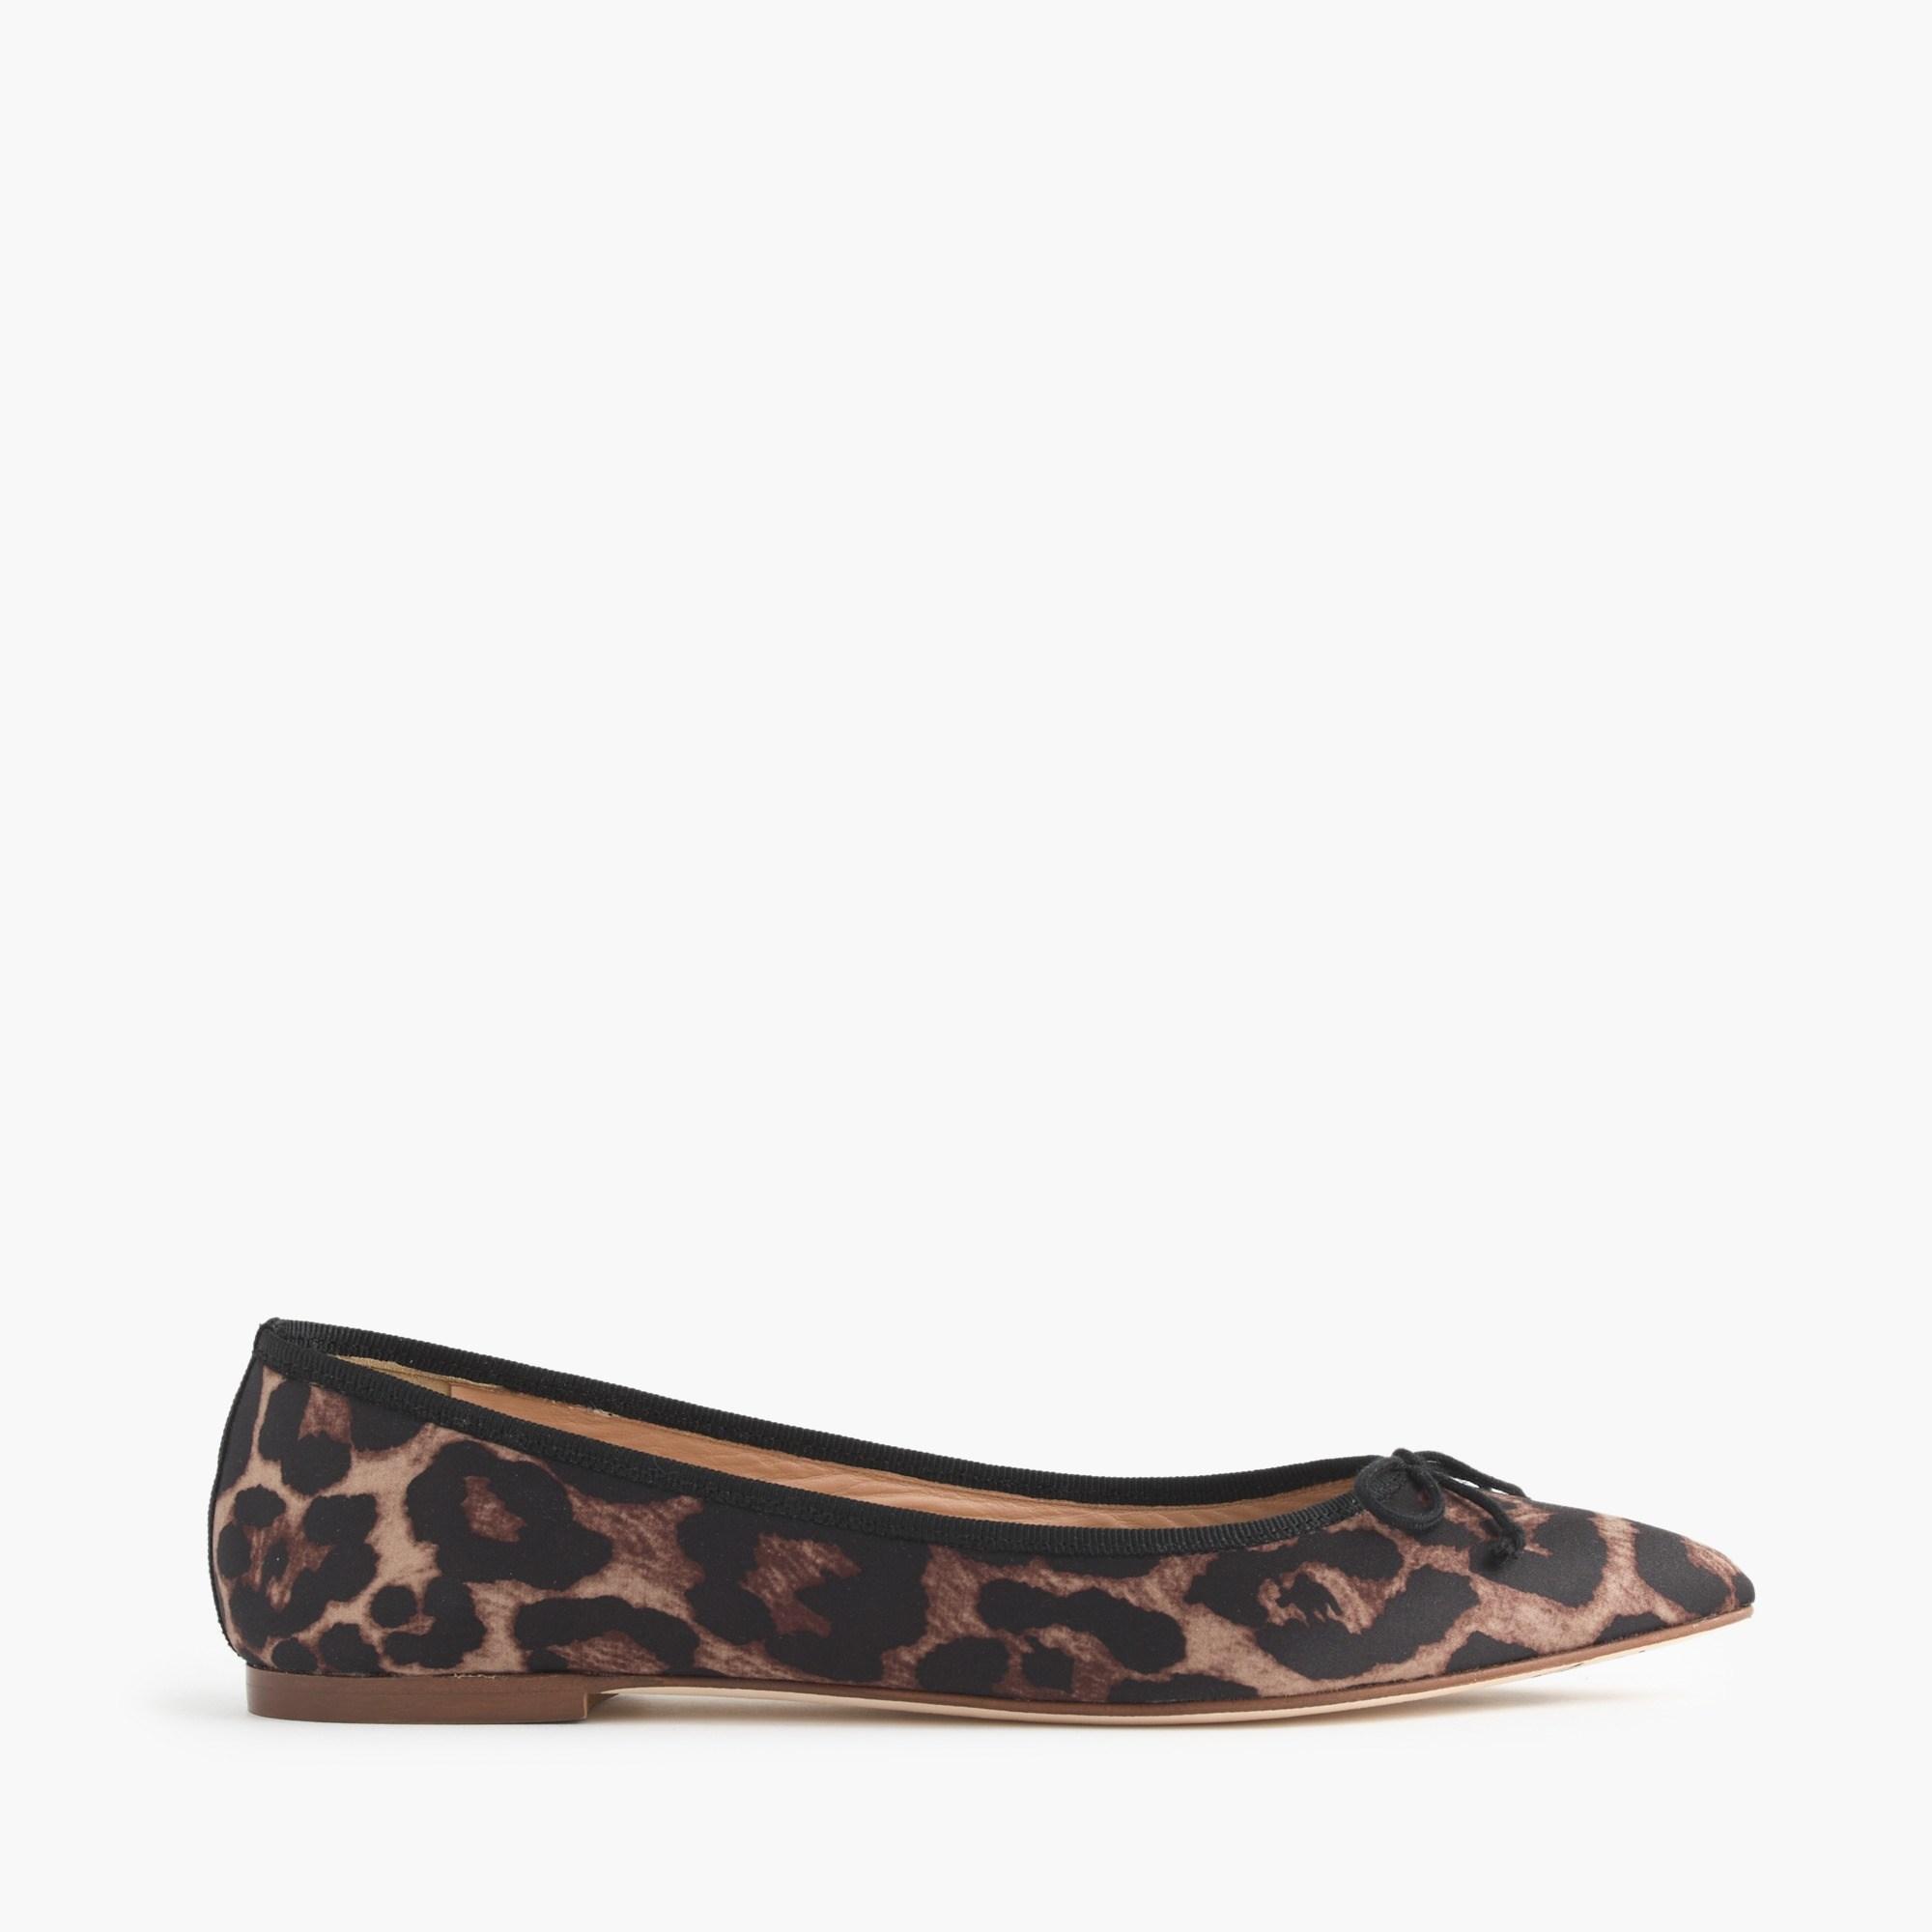 Gemma Leopard Flats : Women's Flats | J.Crew